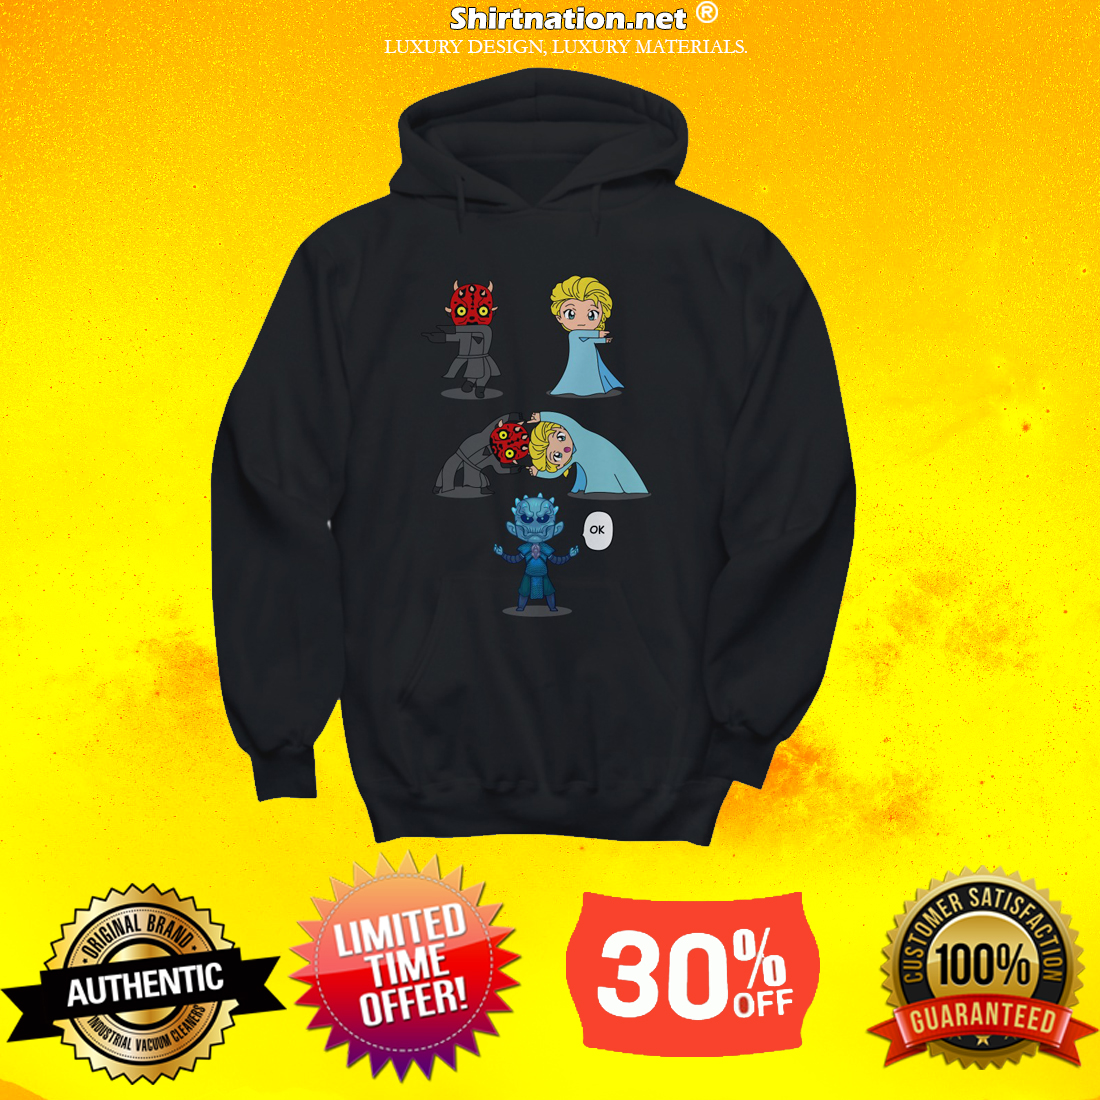 Darth Maul and Elsa shirt and hoodie